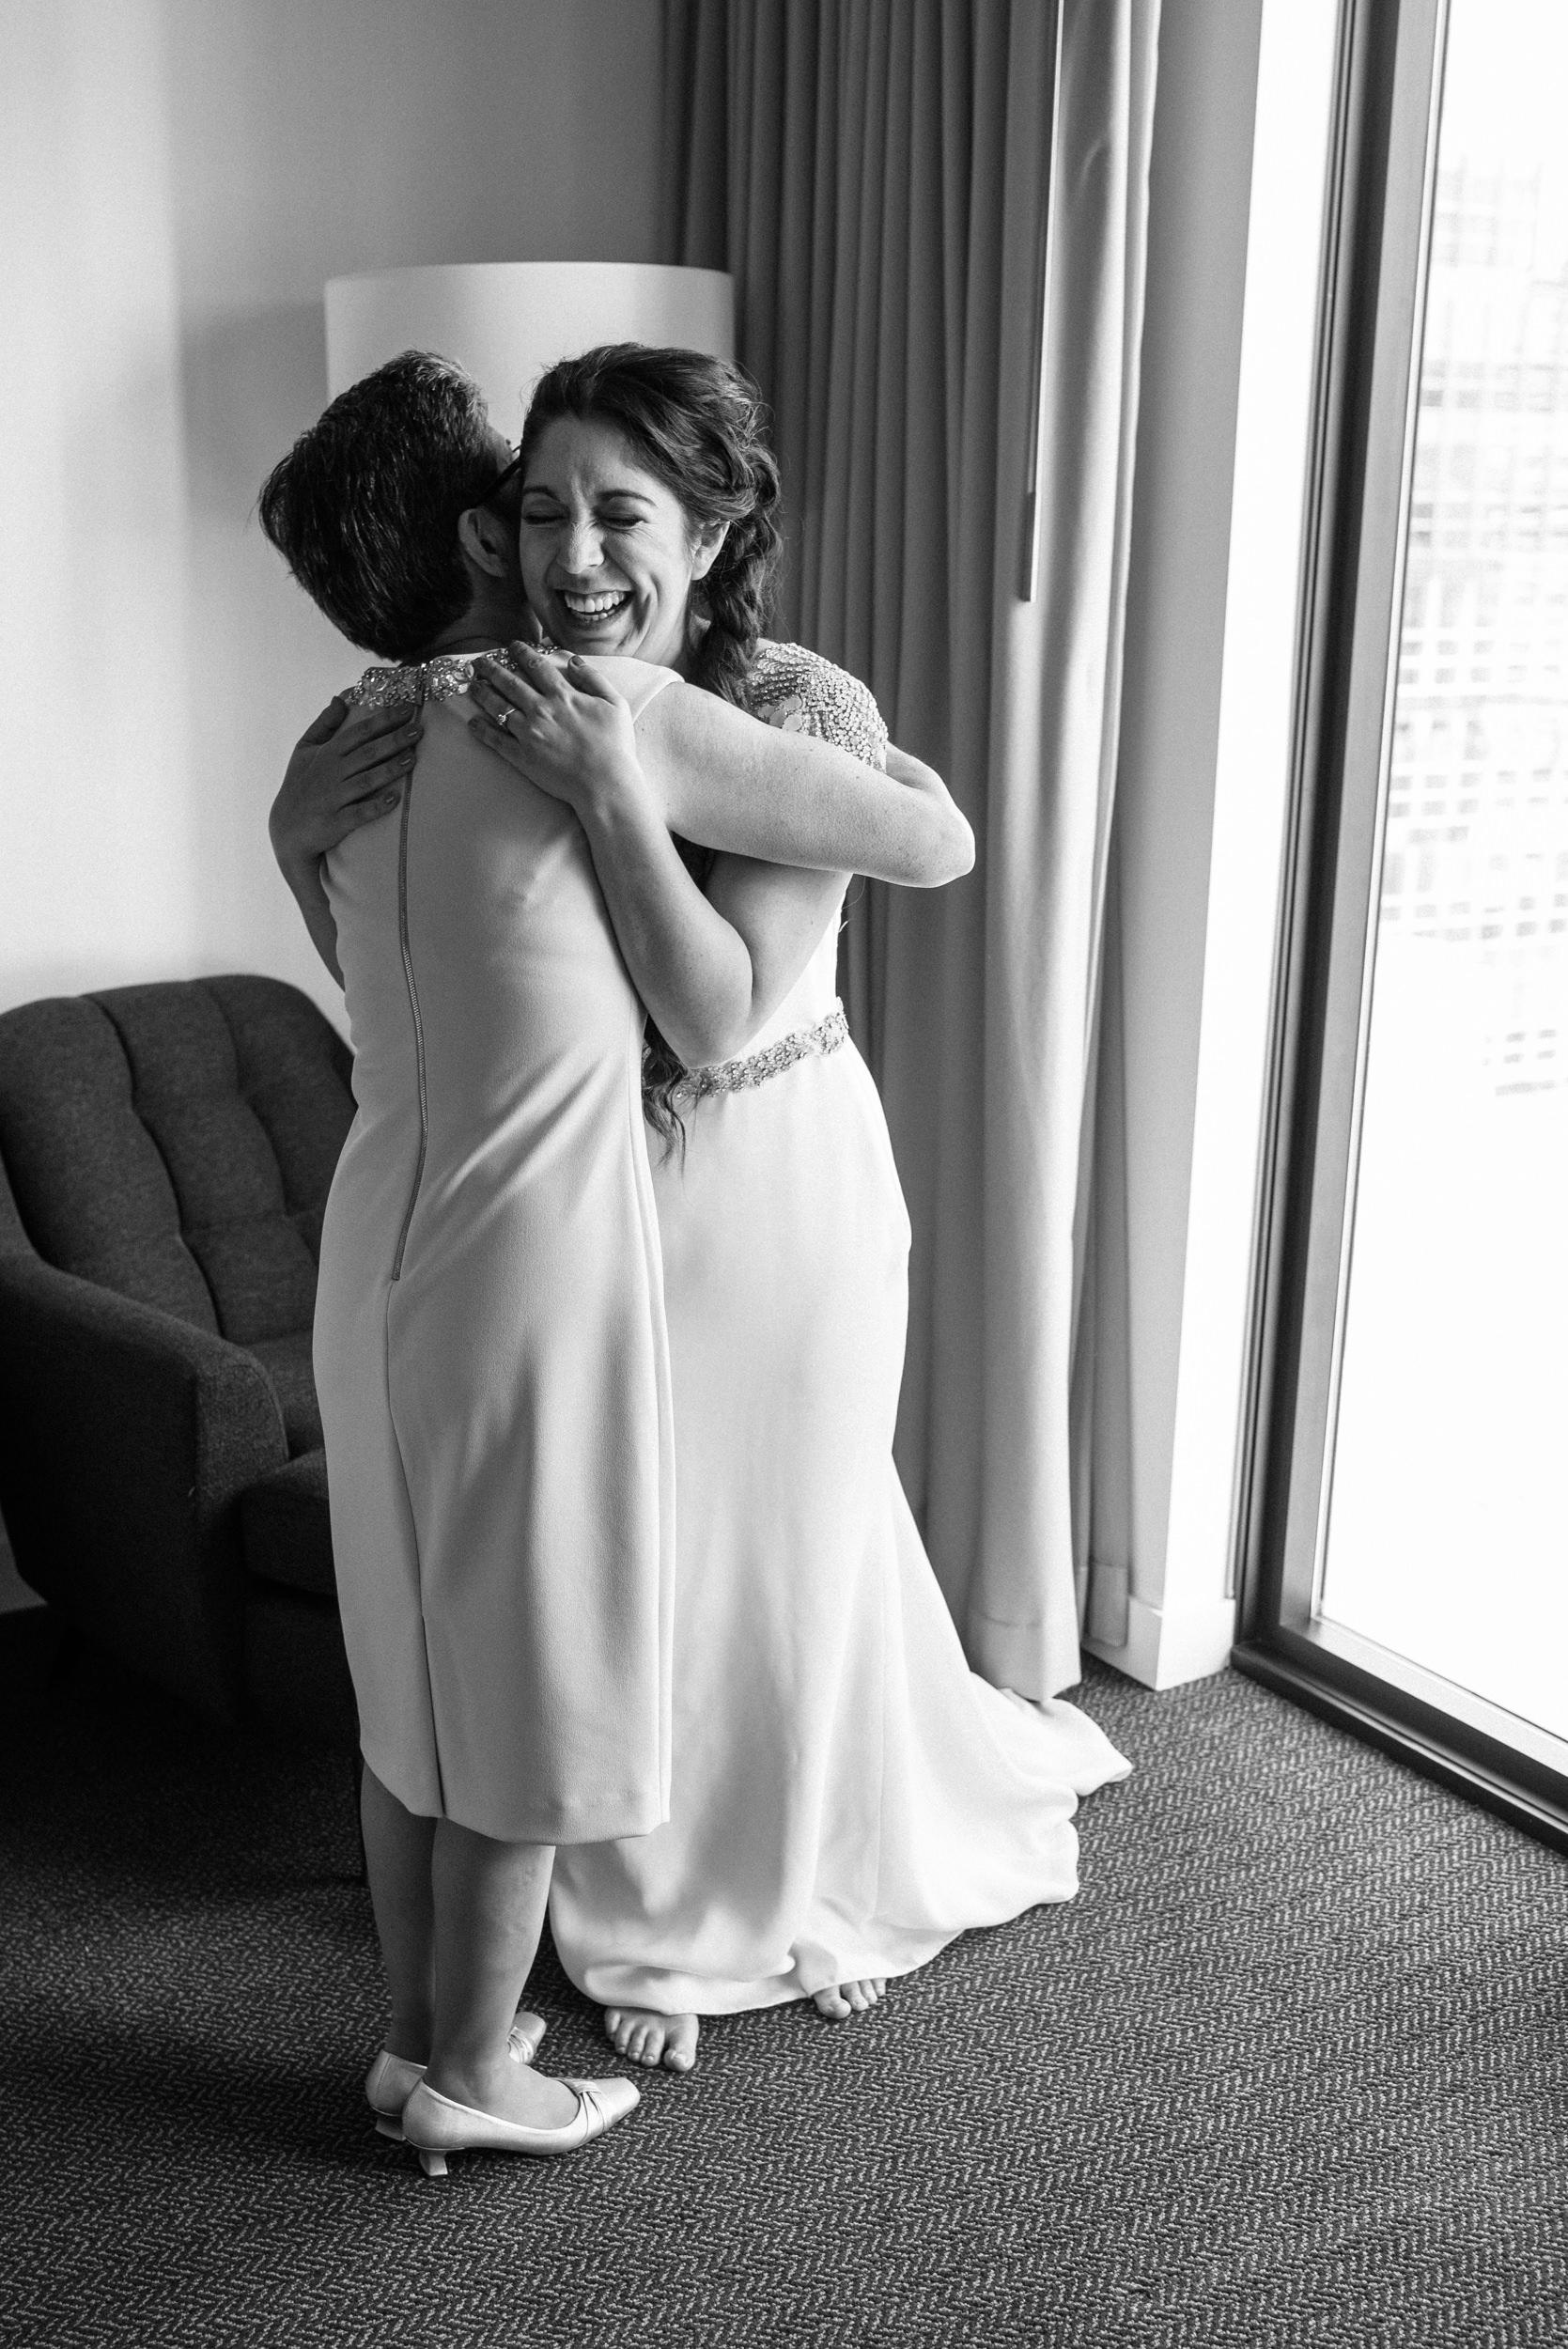 Colorado Denver Downtown Urban Wedding Colorado Wedding Photographer Mom and Bride